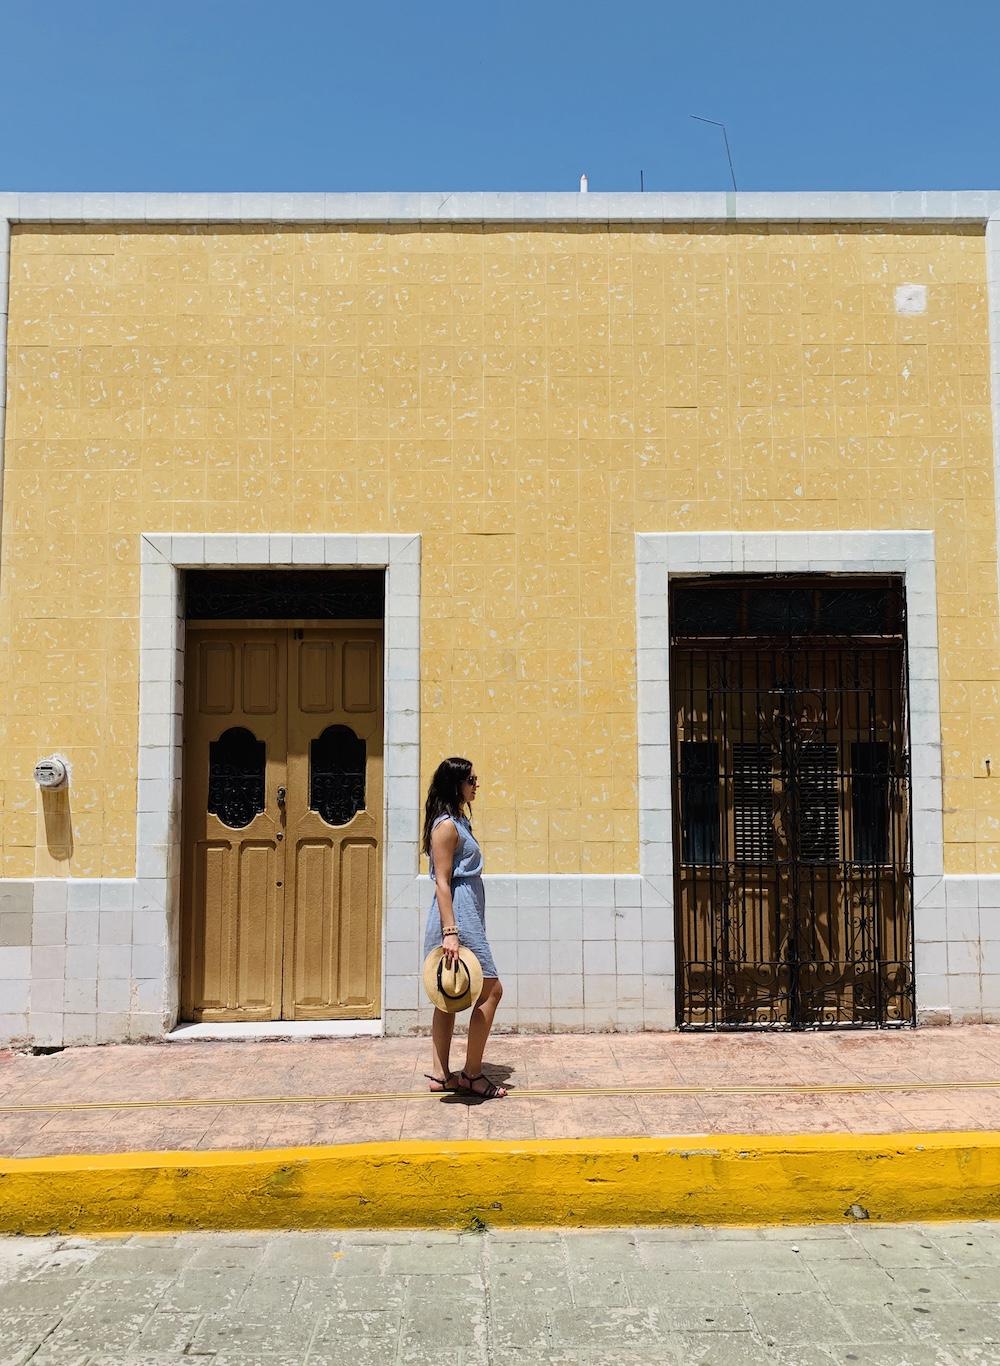 palenque in mexico